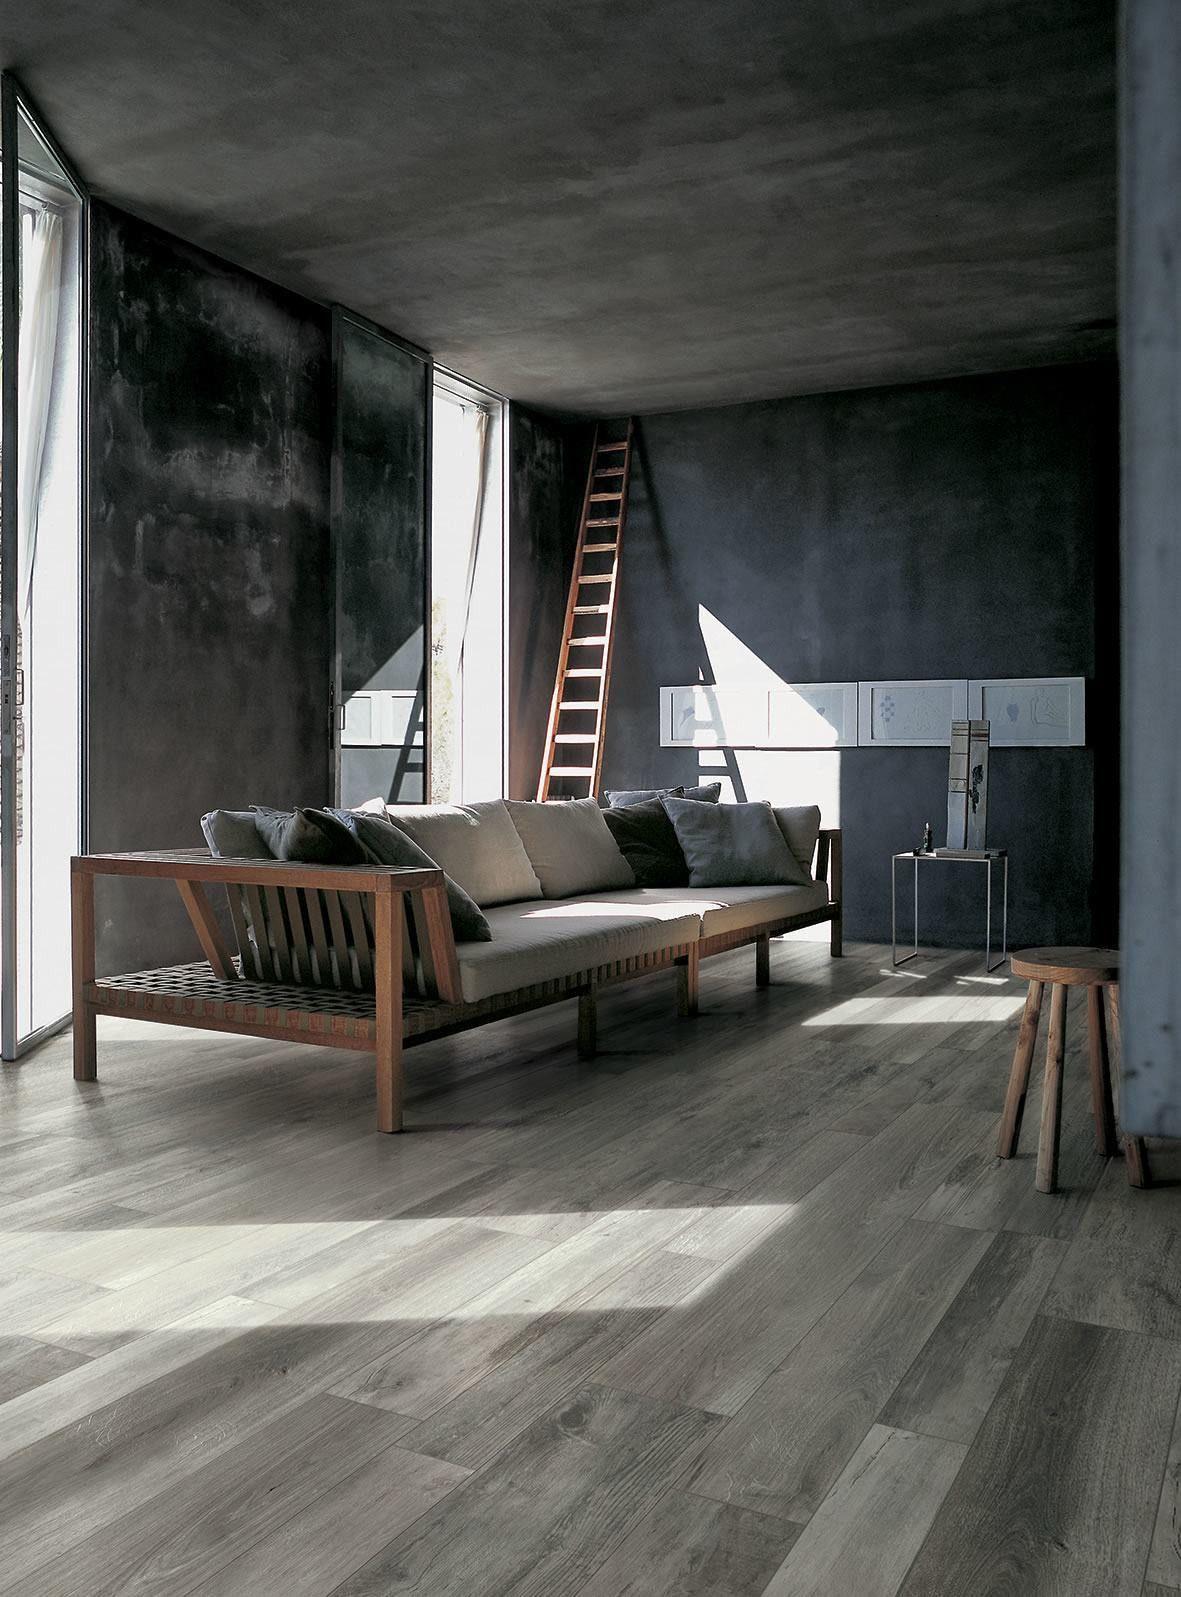 Kronos #Wood-Side Kauri 26,5x180 cm 6507 | #Feinsteinzeug #Holzoptik ...